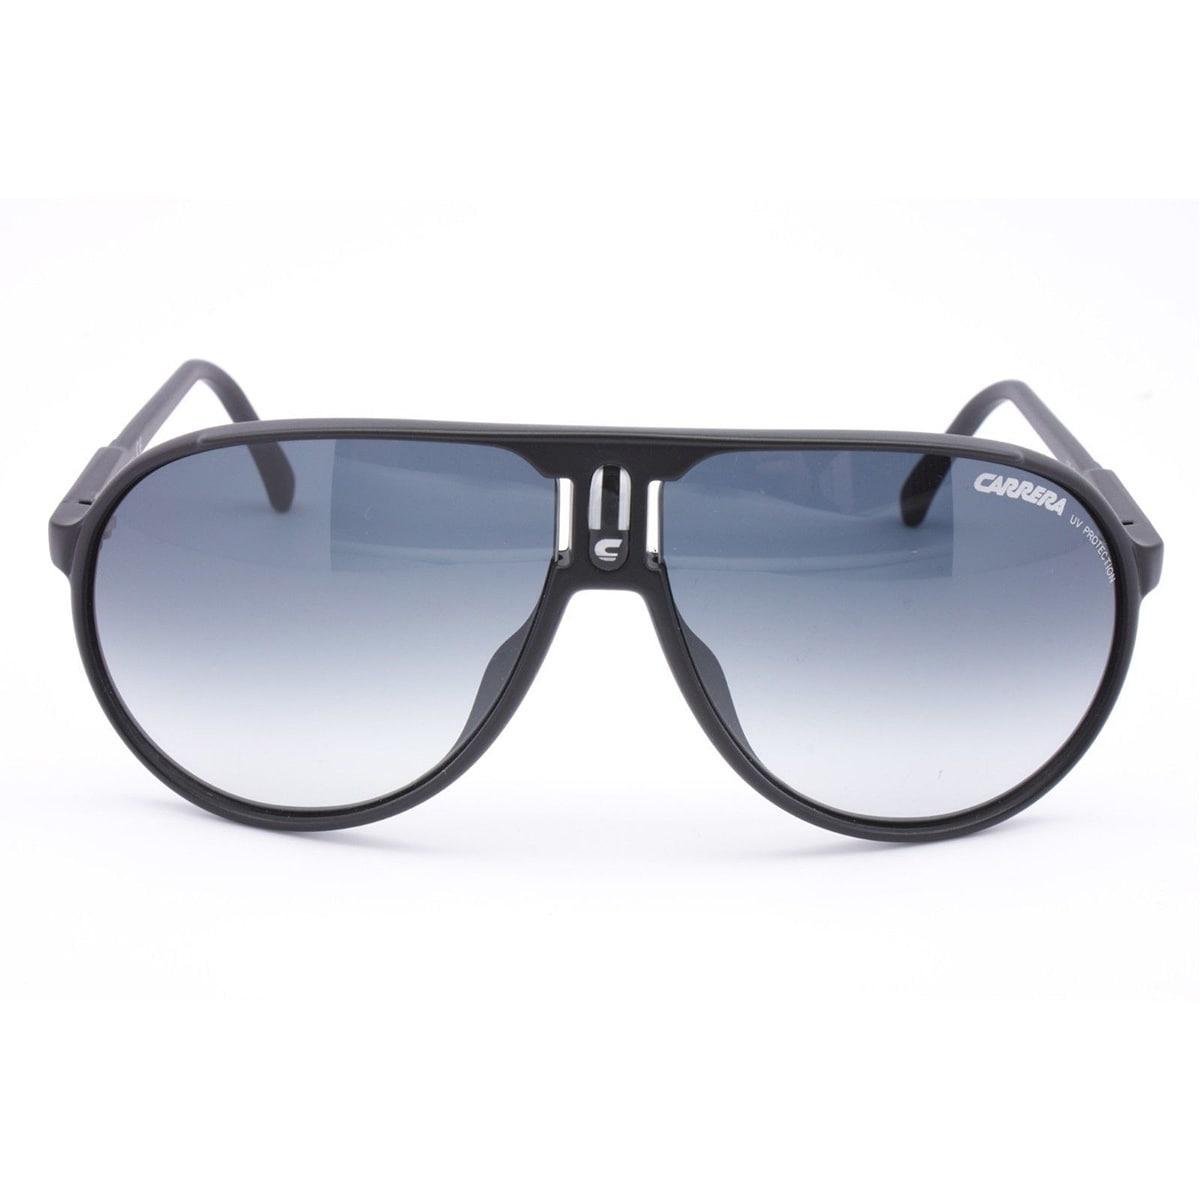 d438204bb4 Shop Carrera Men s  Champion L S  Matte Black Plastic Aviator Sunglasses -  Extra Large - Free Shipping Today - Overstock - 9035271